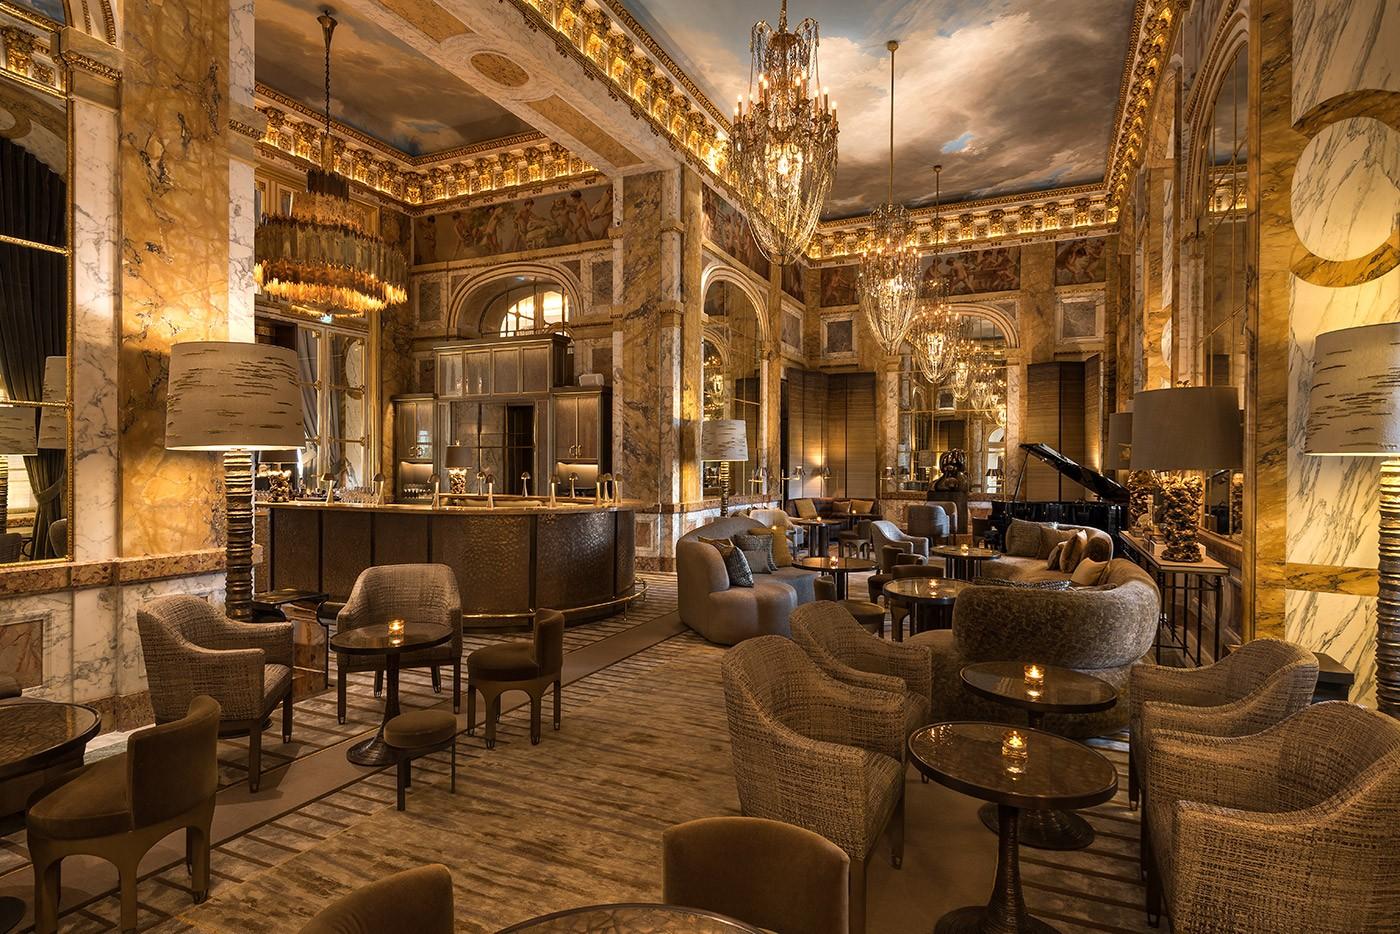 10 best new luxury hotels of 2017   Style Magazine   South China ...